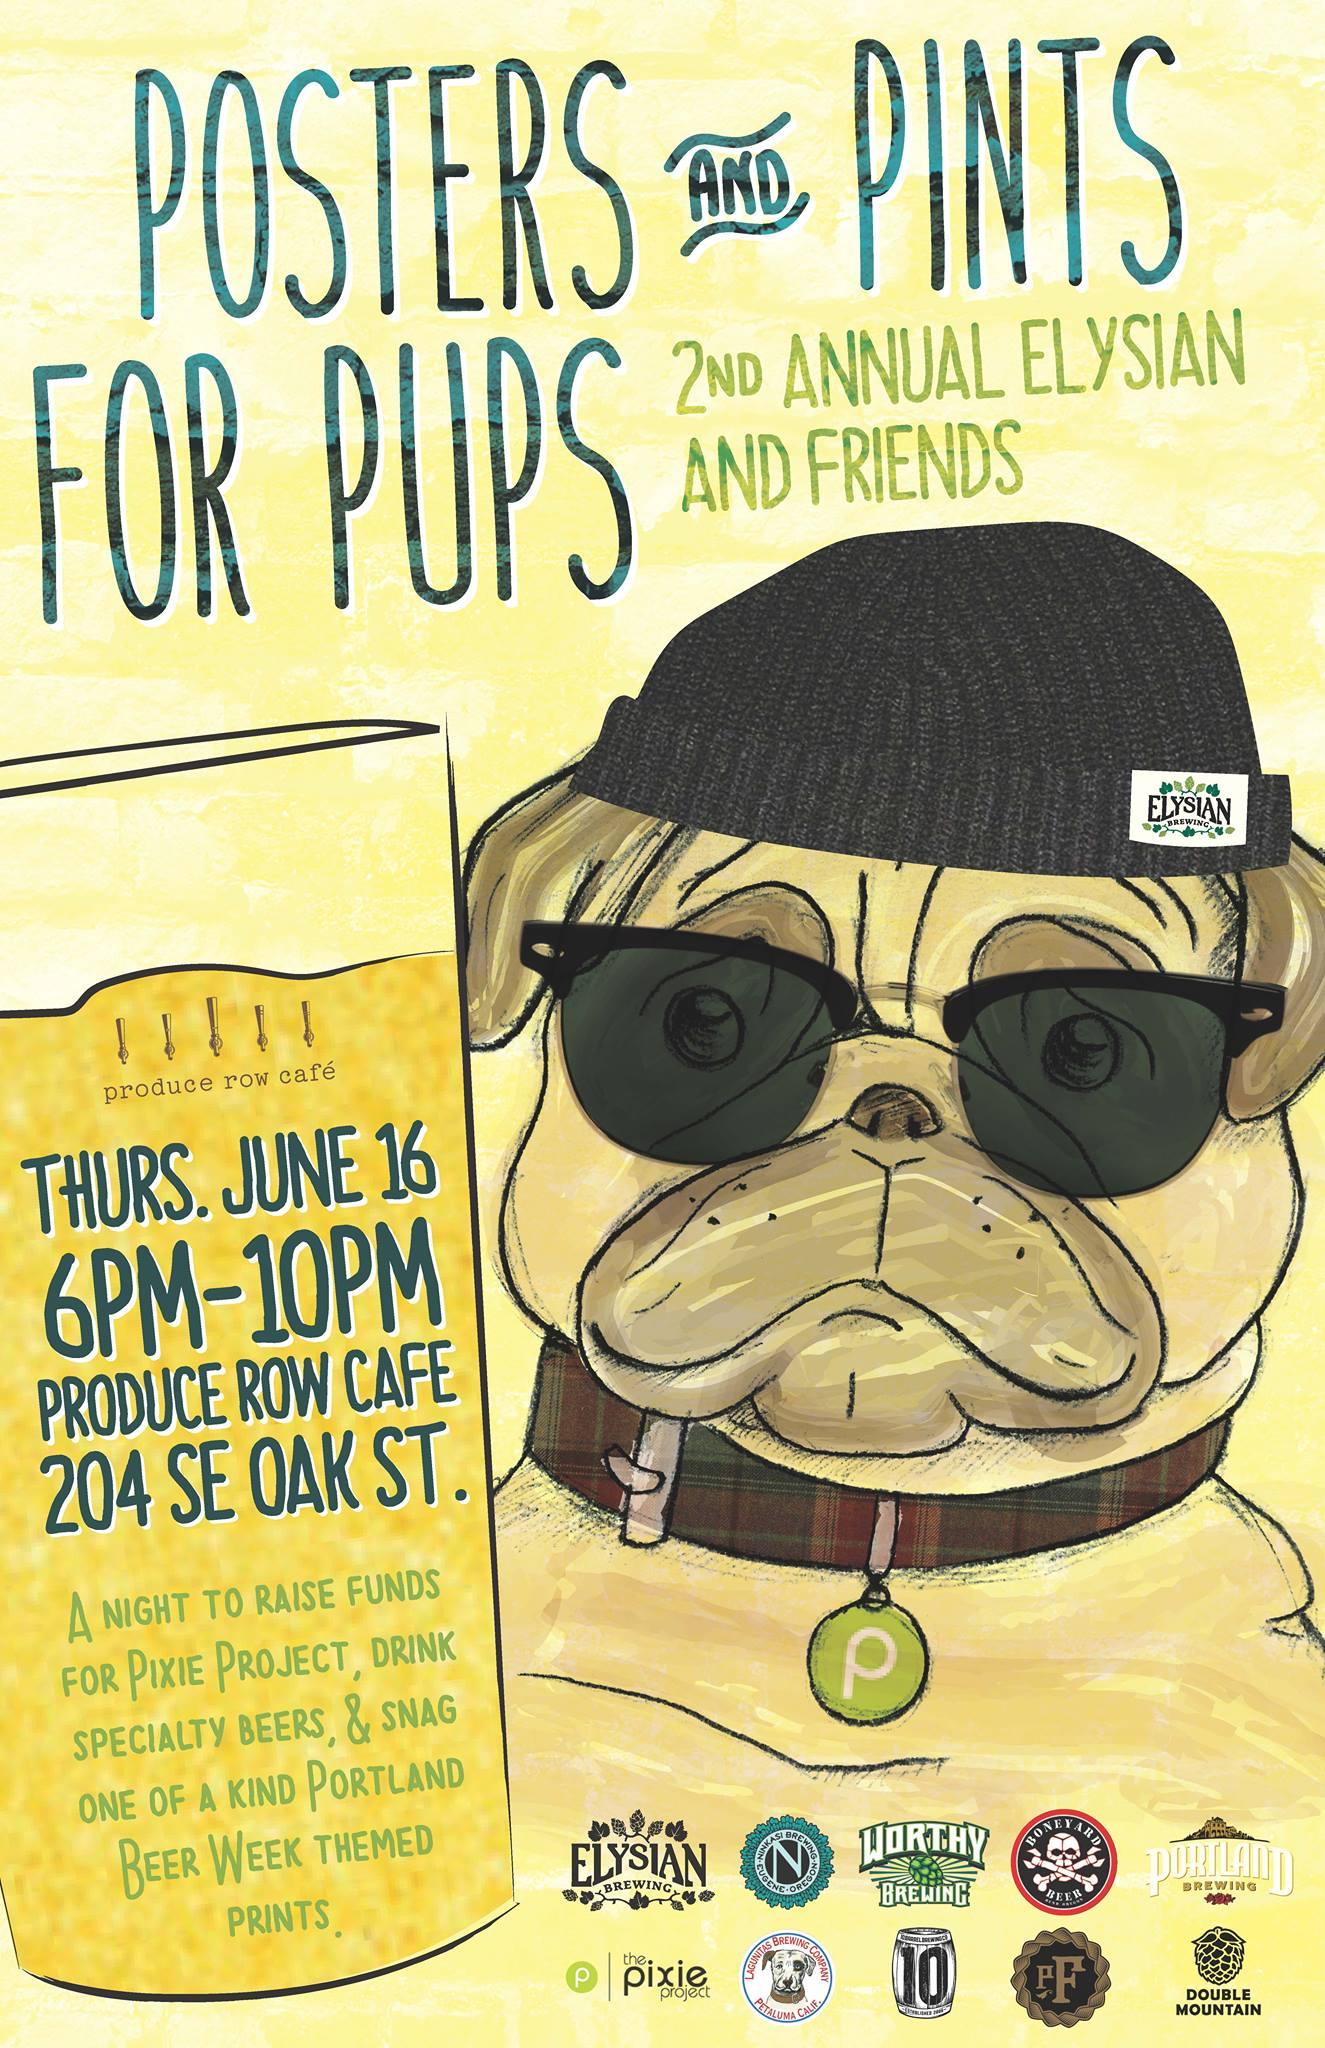 Elysian & Friends Presents Posters & Pints for Pups